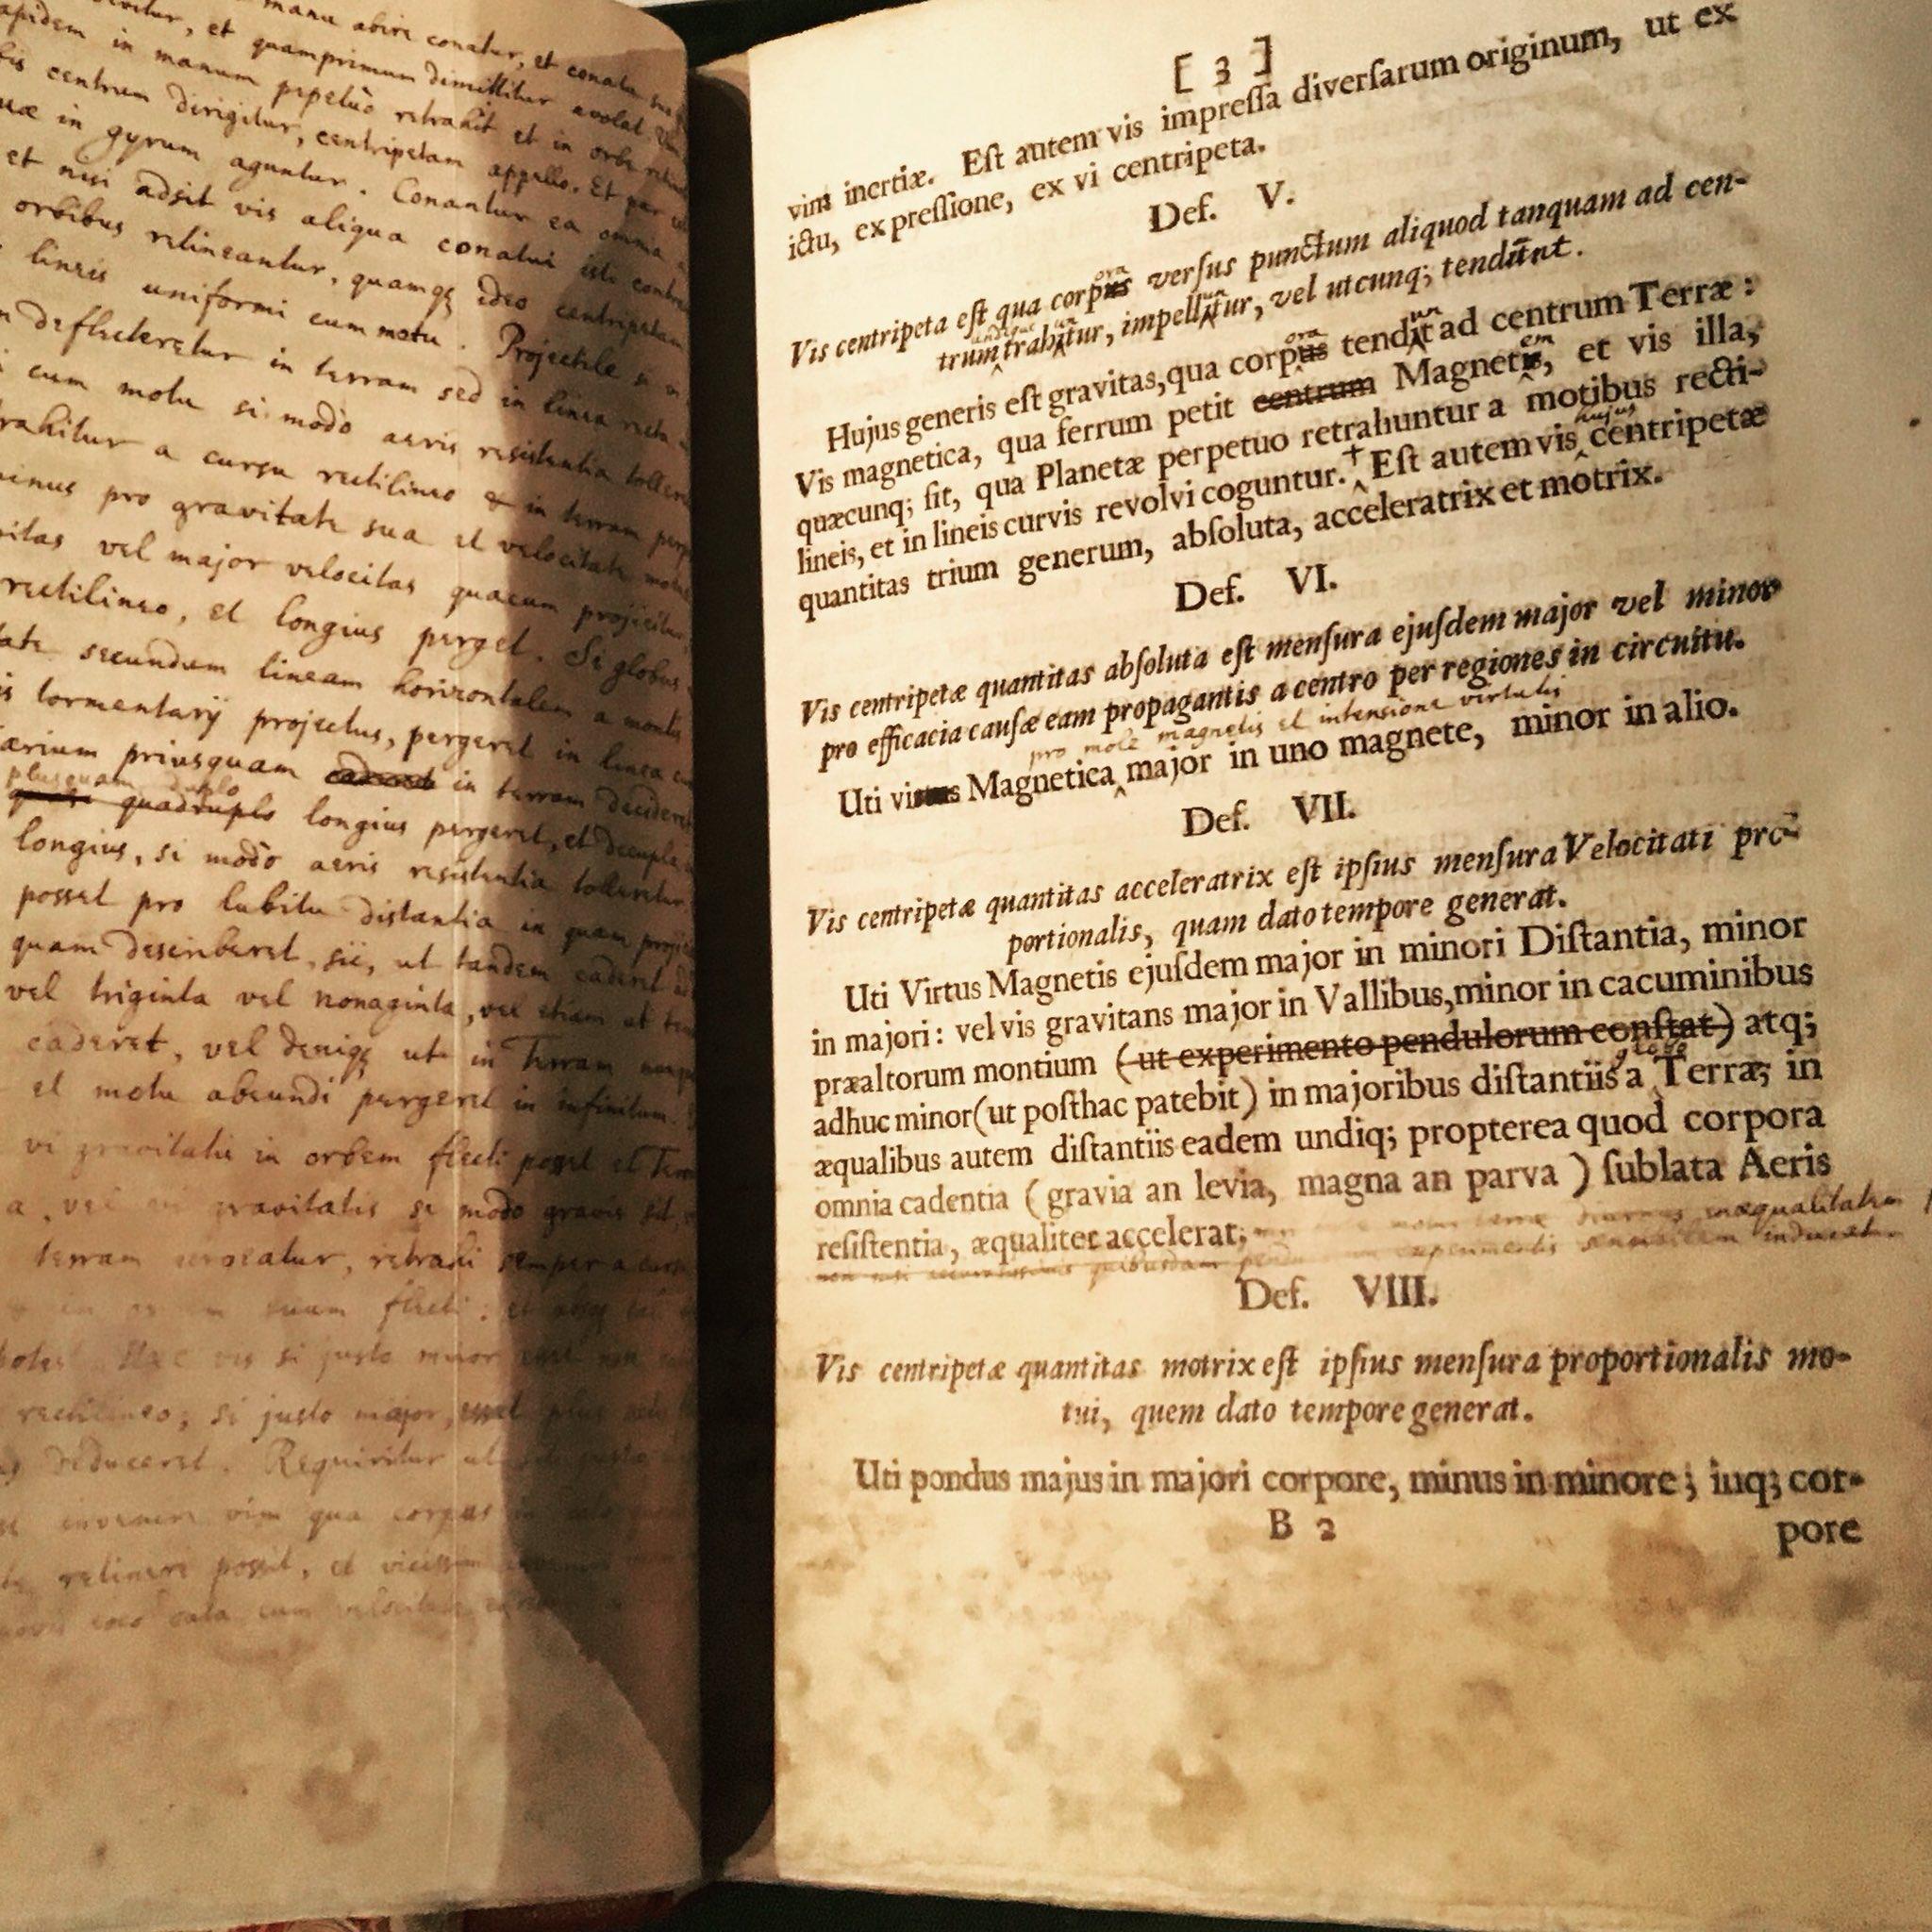 bol.com | Philosophiae Naturalis Principia Mathematica by ...